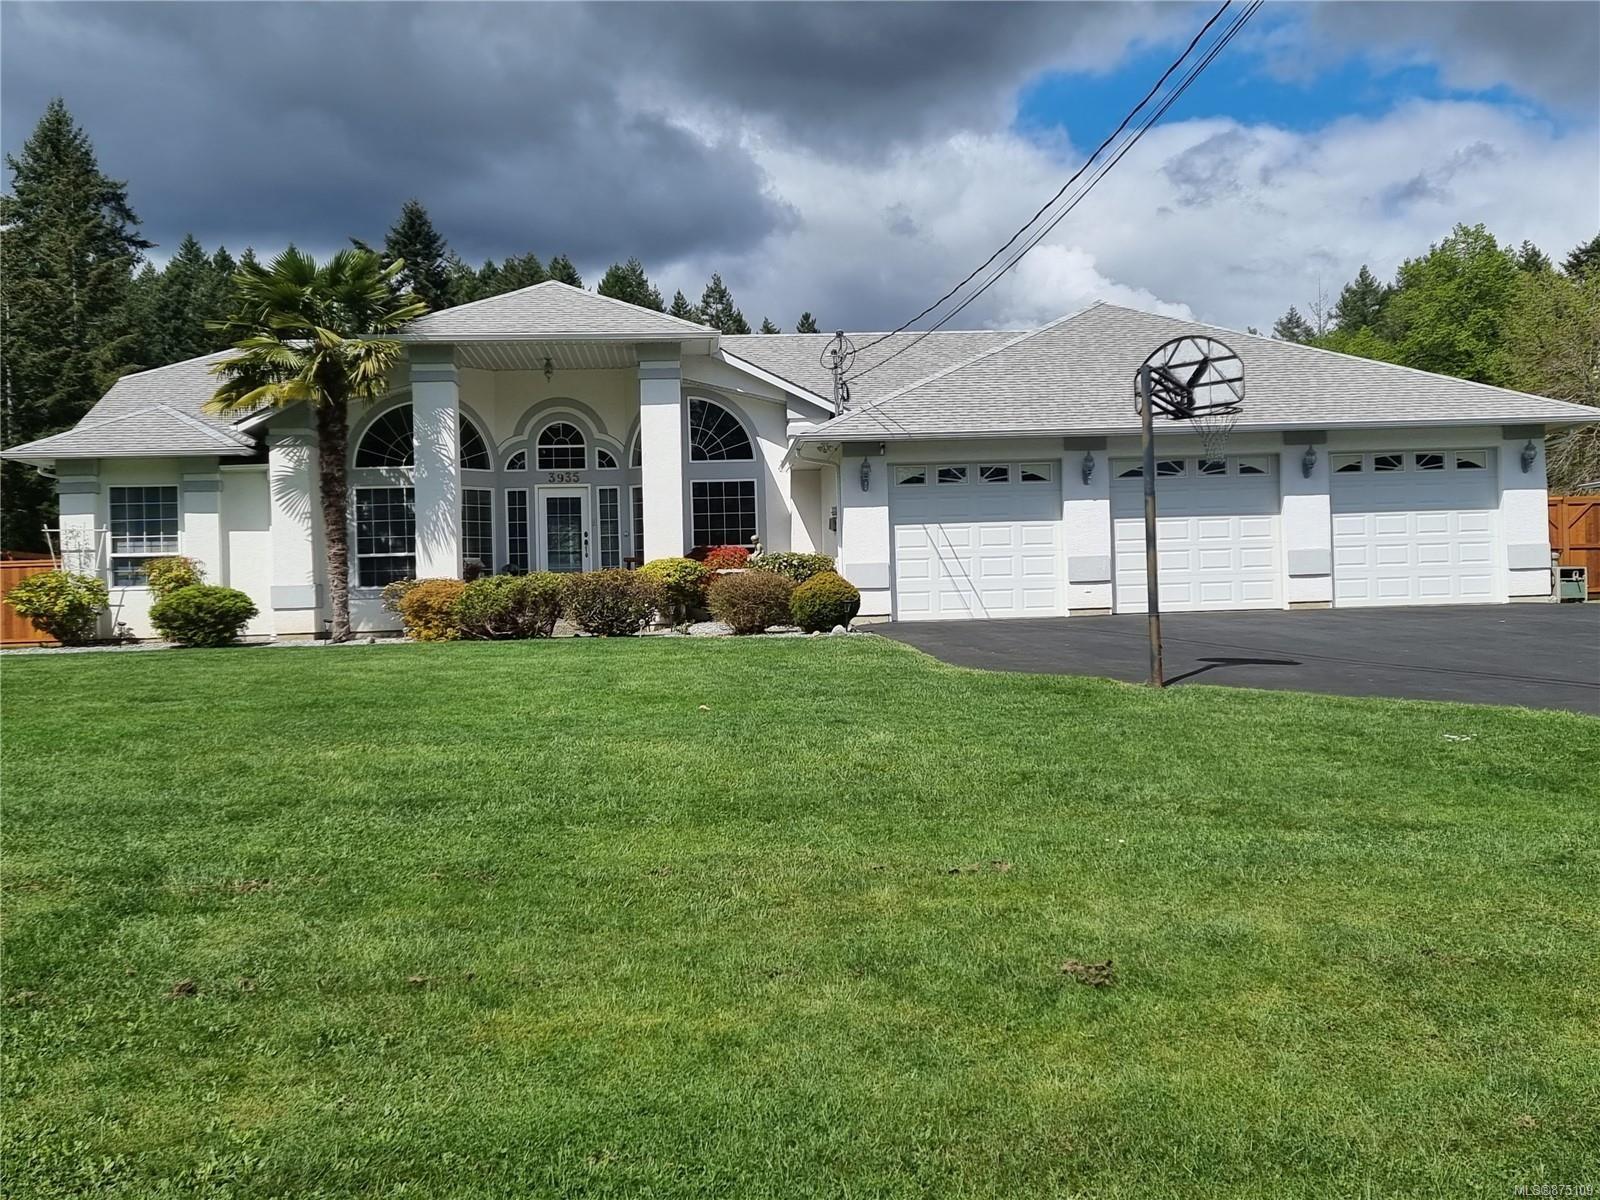 Main Photo: 3935 Moore Rd in : PA Alberni Valley House for sale (Port Alberni)  : MLS®# 875109